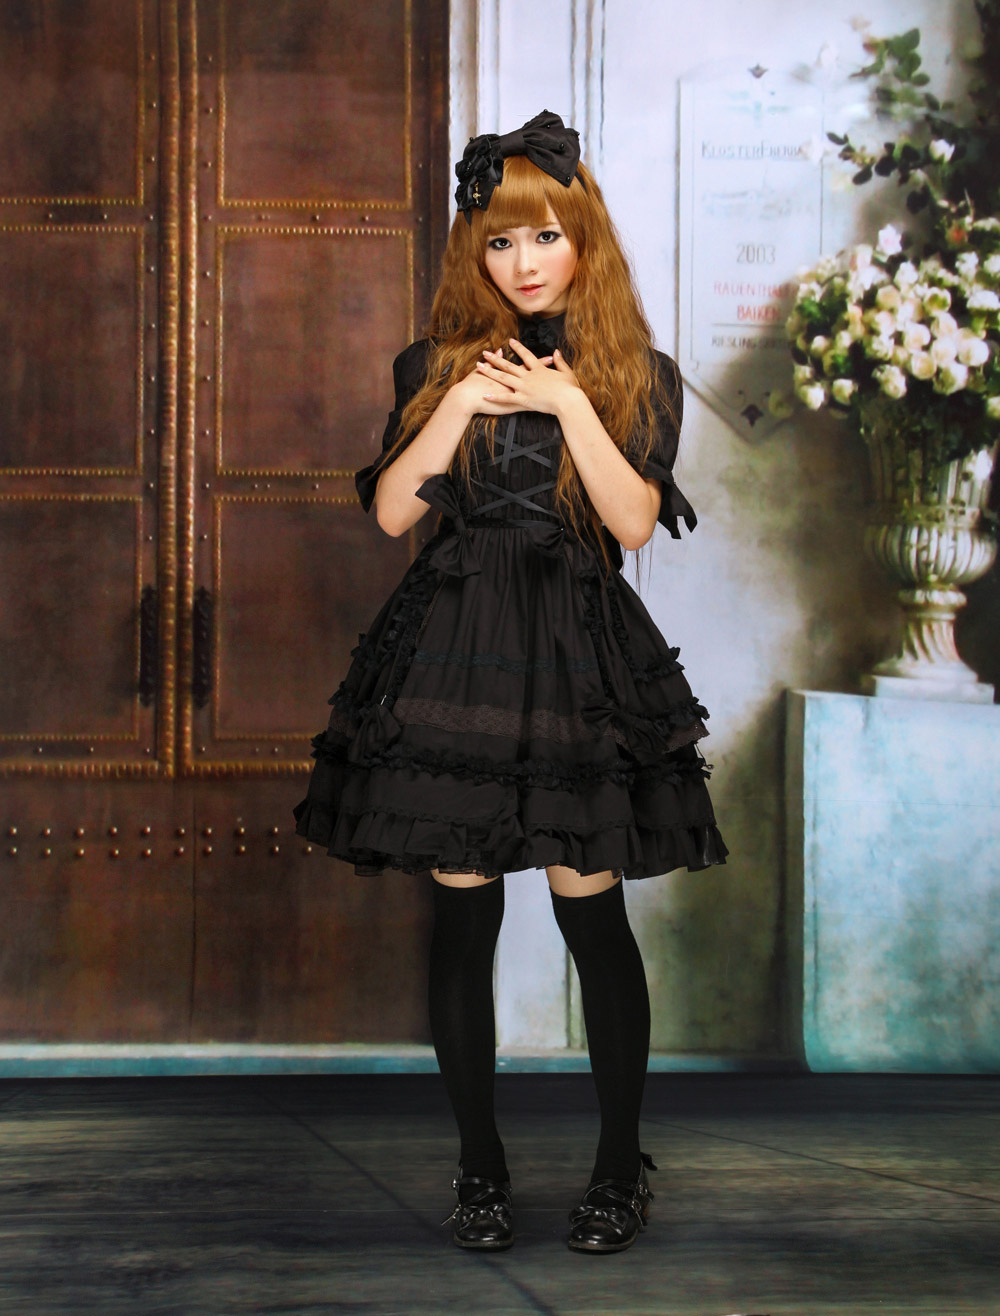 Black Turndown Collar Ruffle Cotton Gothic Lolita Dress